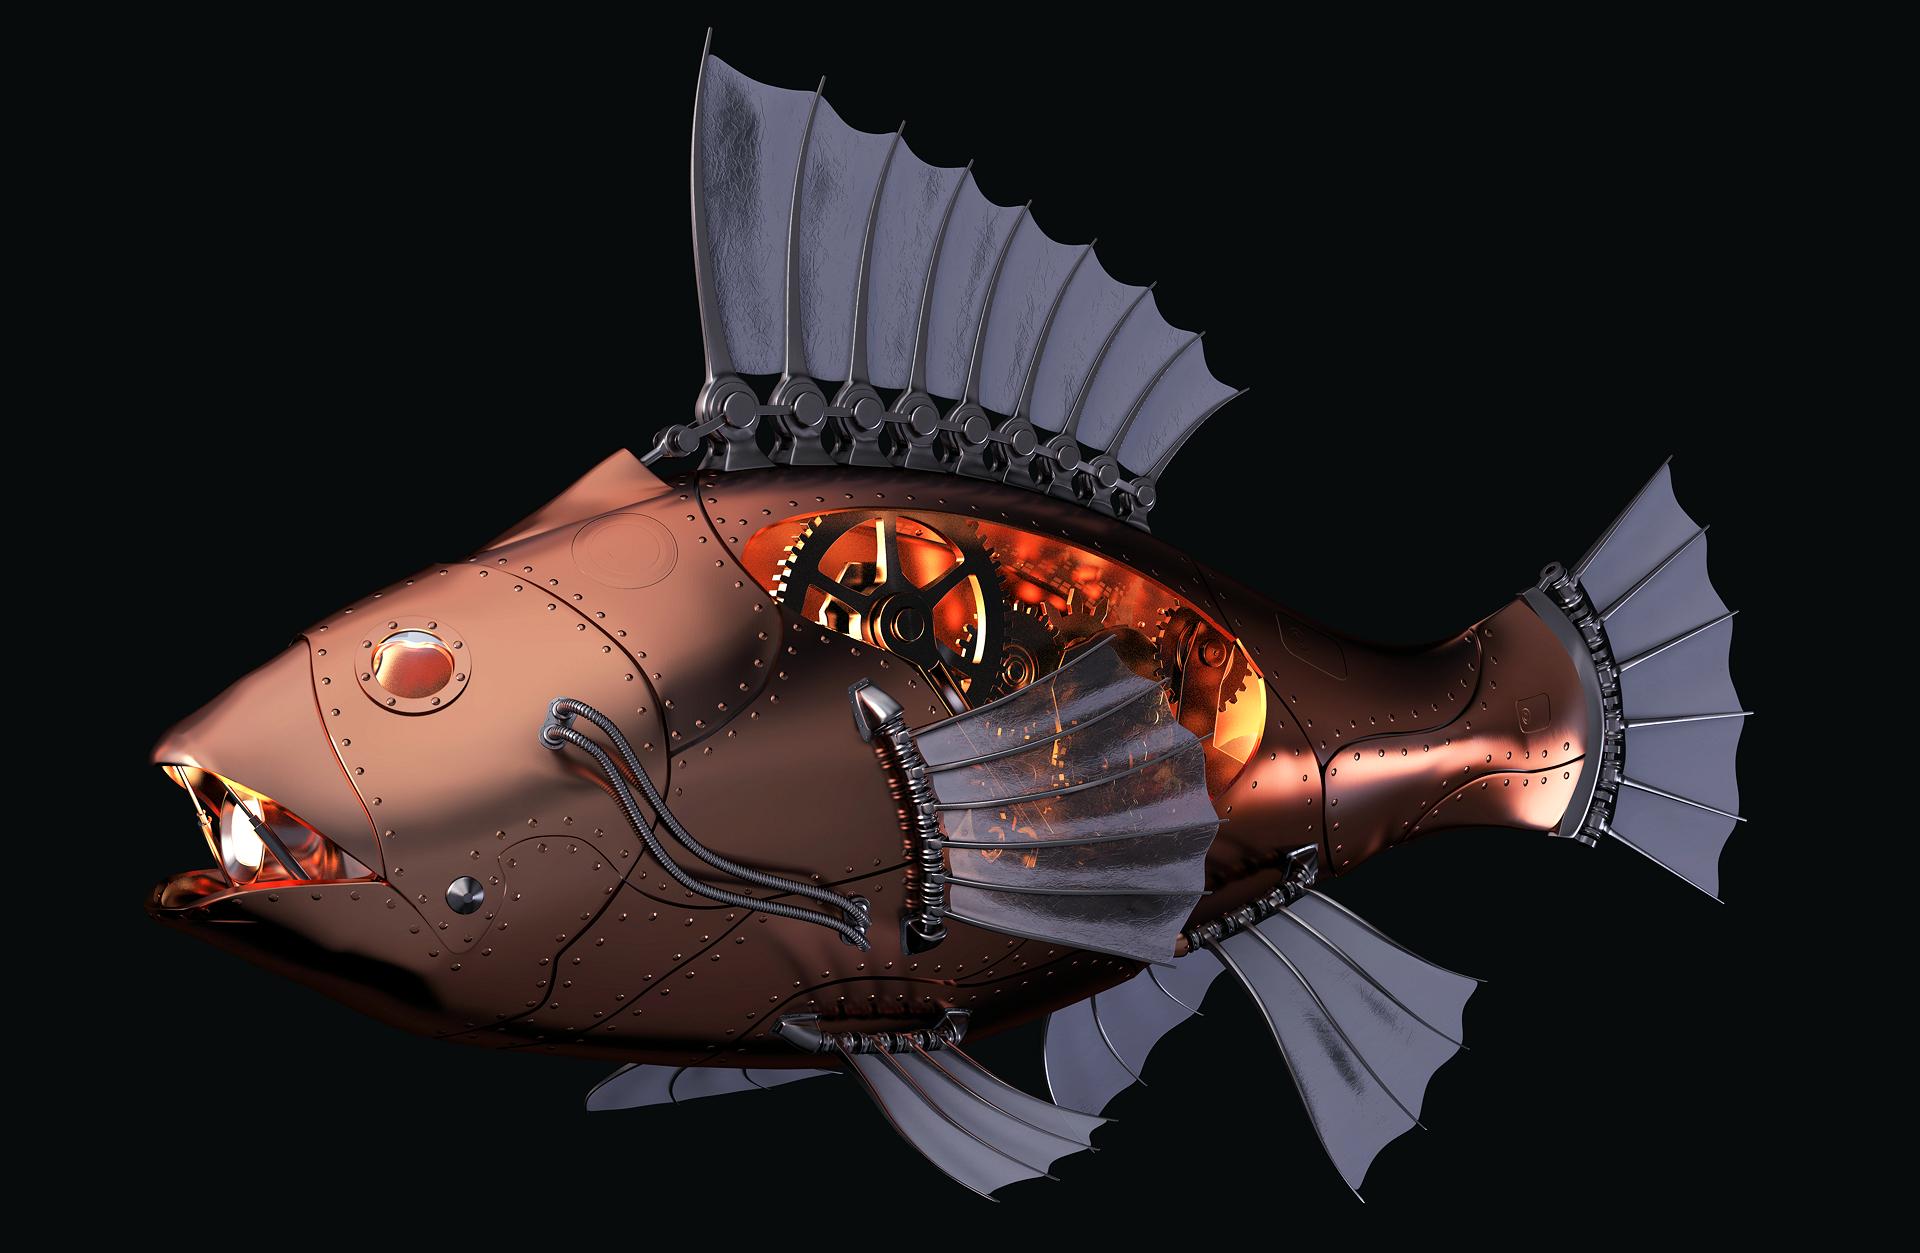 06_robofish - 1920-1250